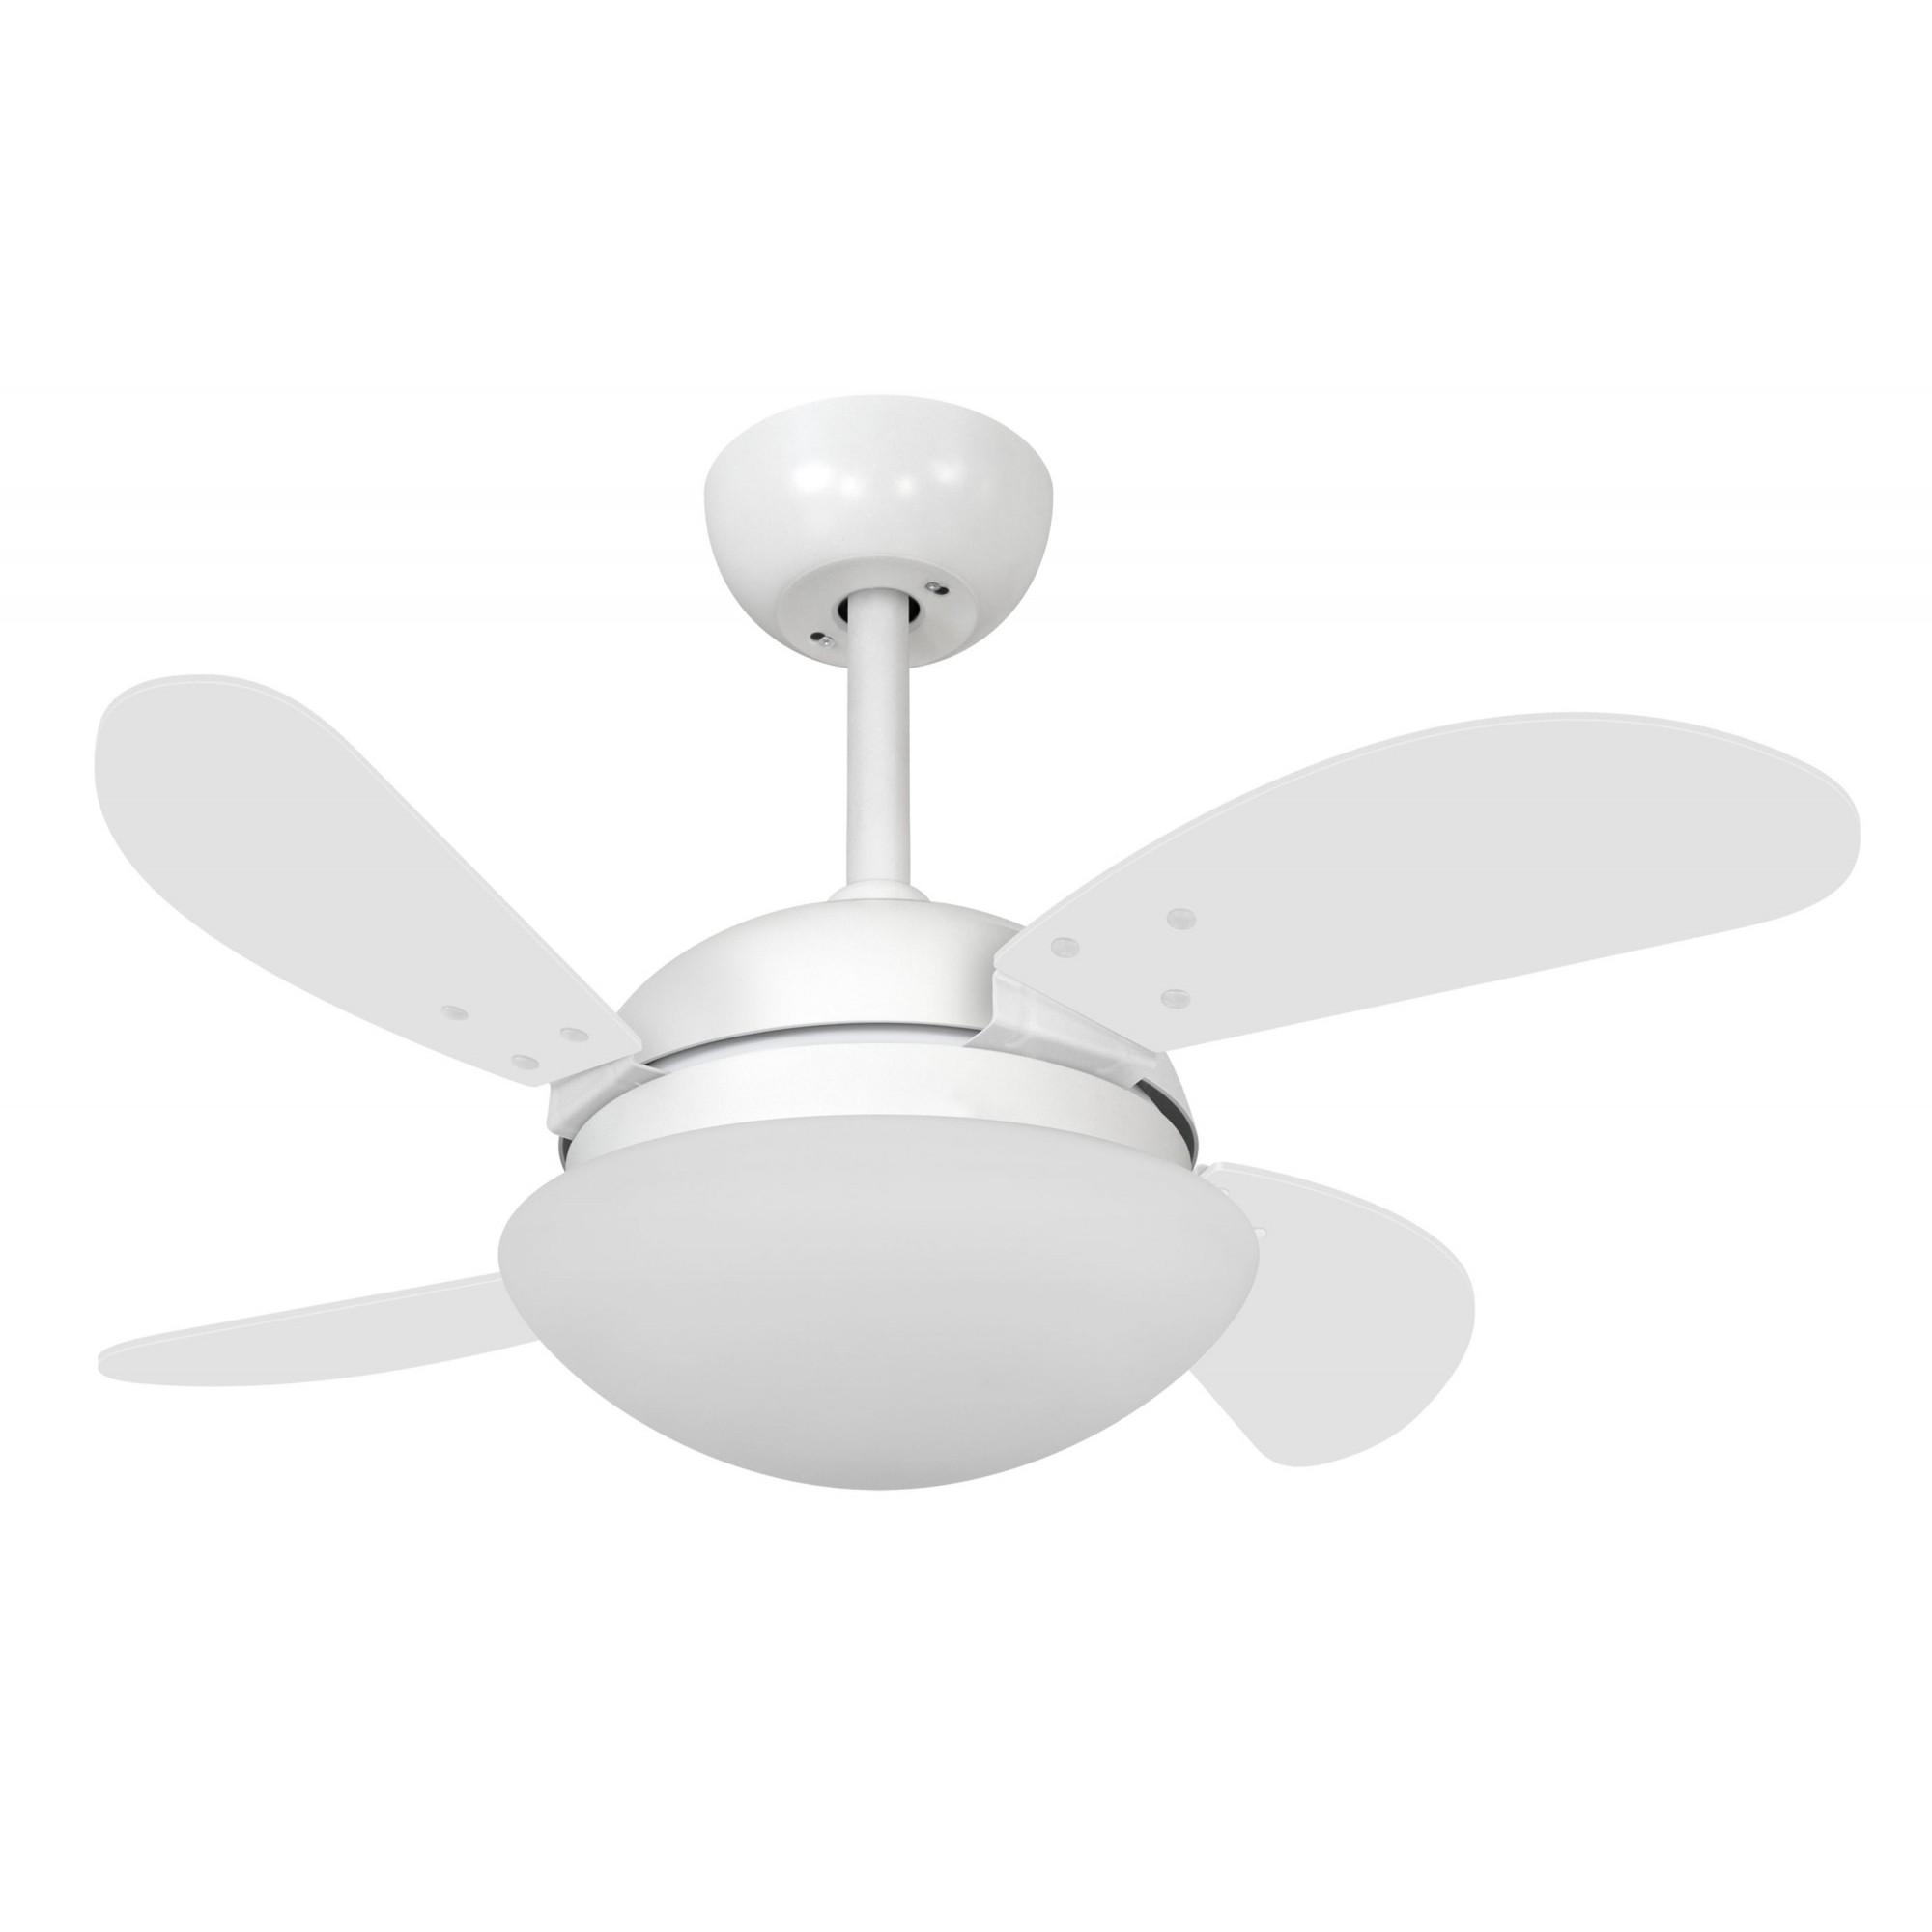 Ventilador de Teto VD28 Mini Fly Branco 4Pás MDF 220V